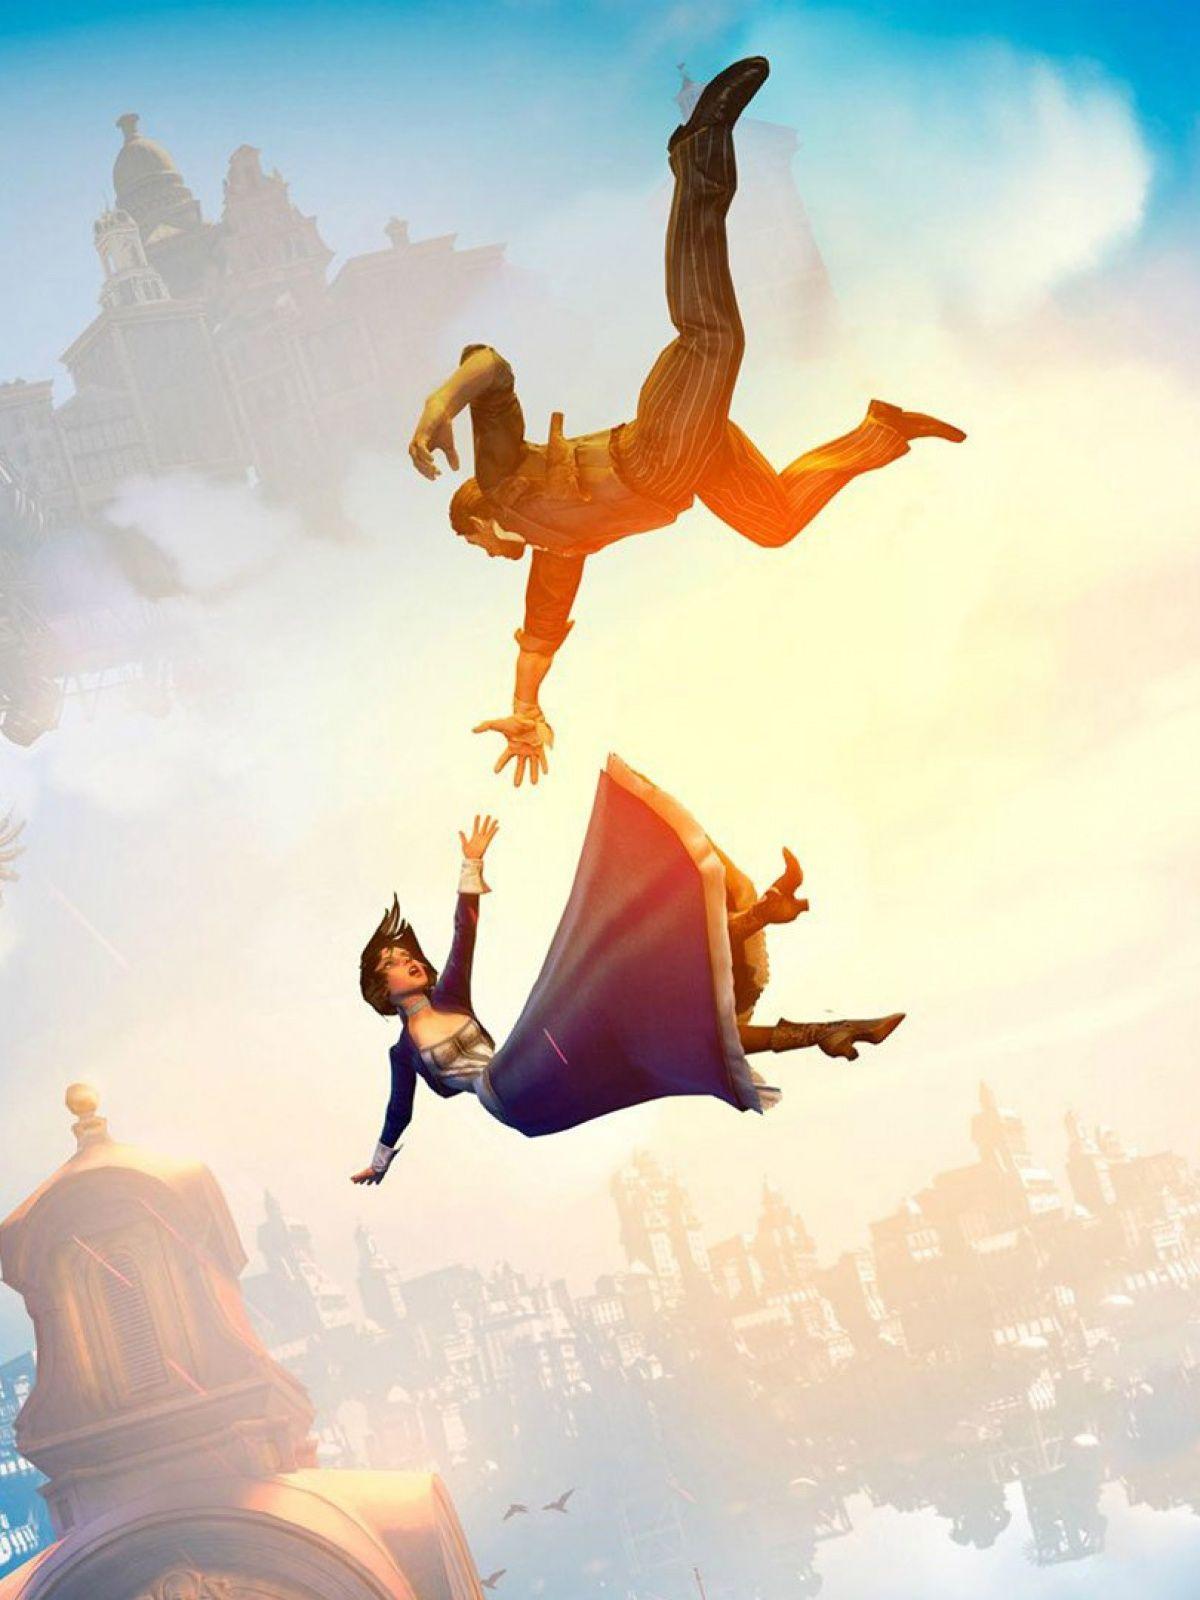 Animation Movie Bioshock Infinite Flying On The Sky Mobile Wallpaper Movie Animation Movie Bioshock Infinite Flyi Bioshock Infinite Bioshock Bioshock Art